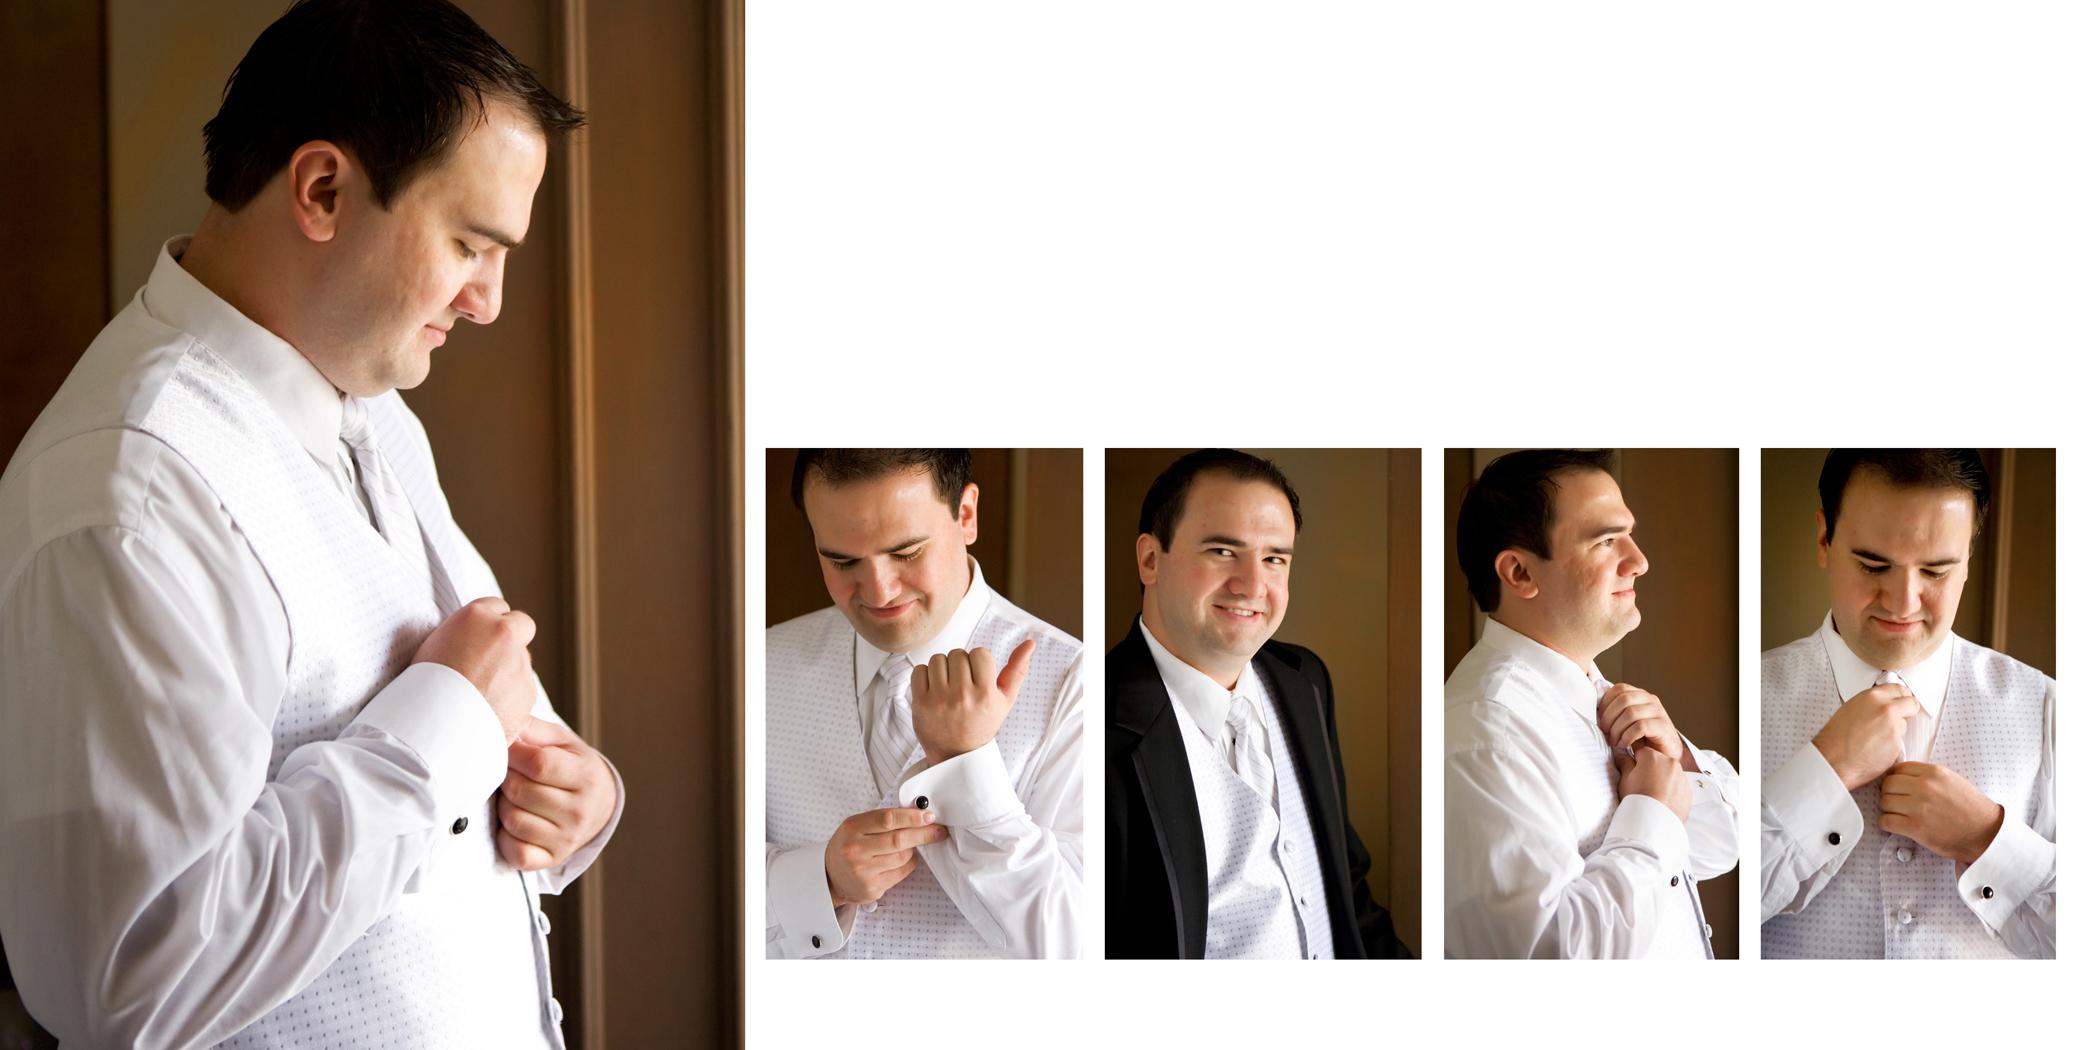 wedding-photography-Andrews-University-Berrien-Springs-Michigan_04.jpg